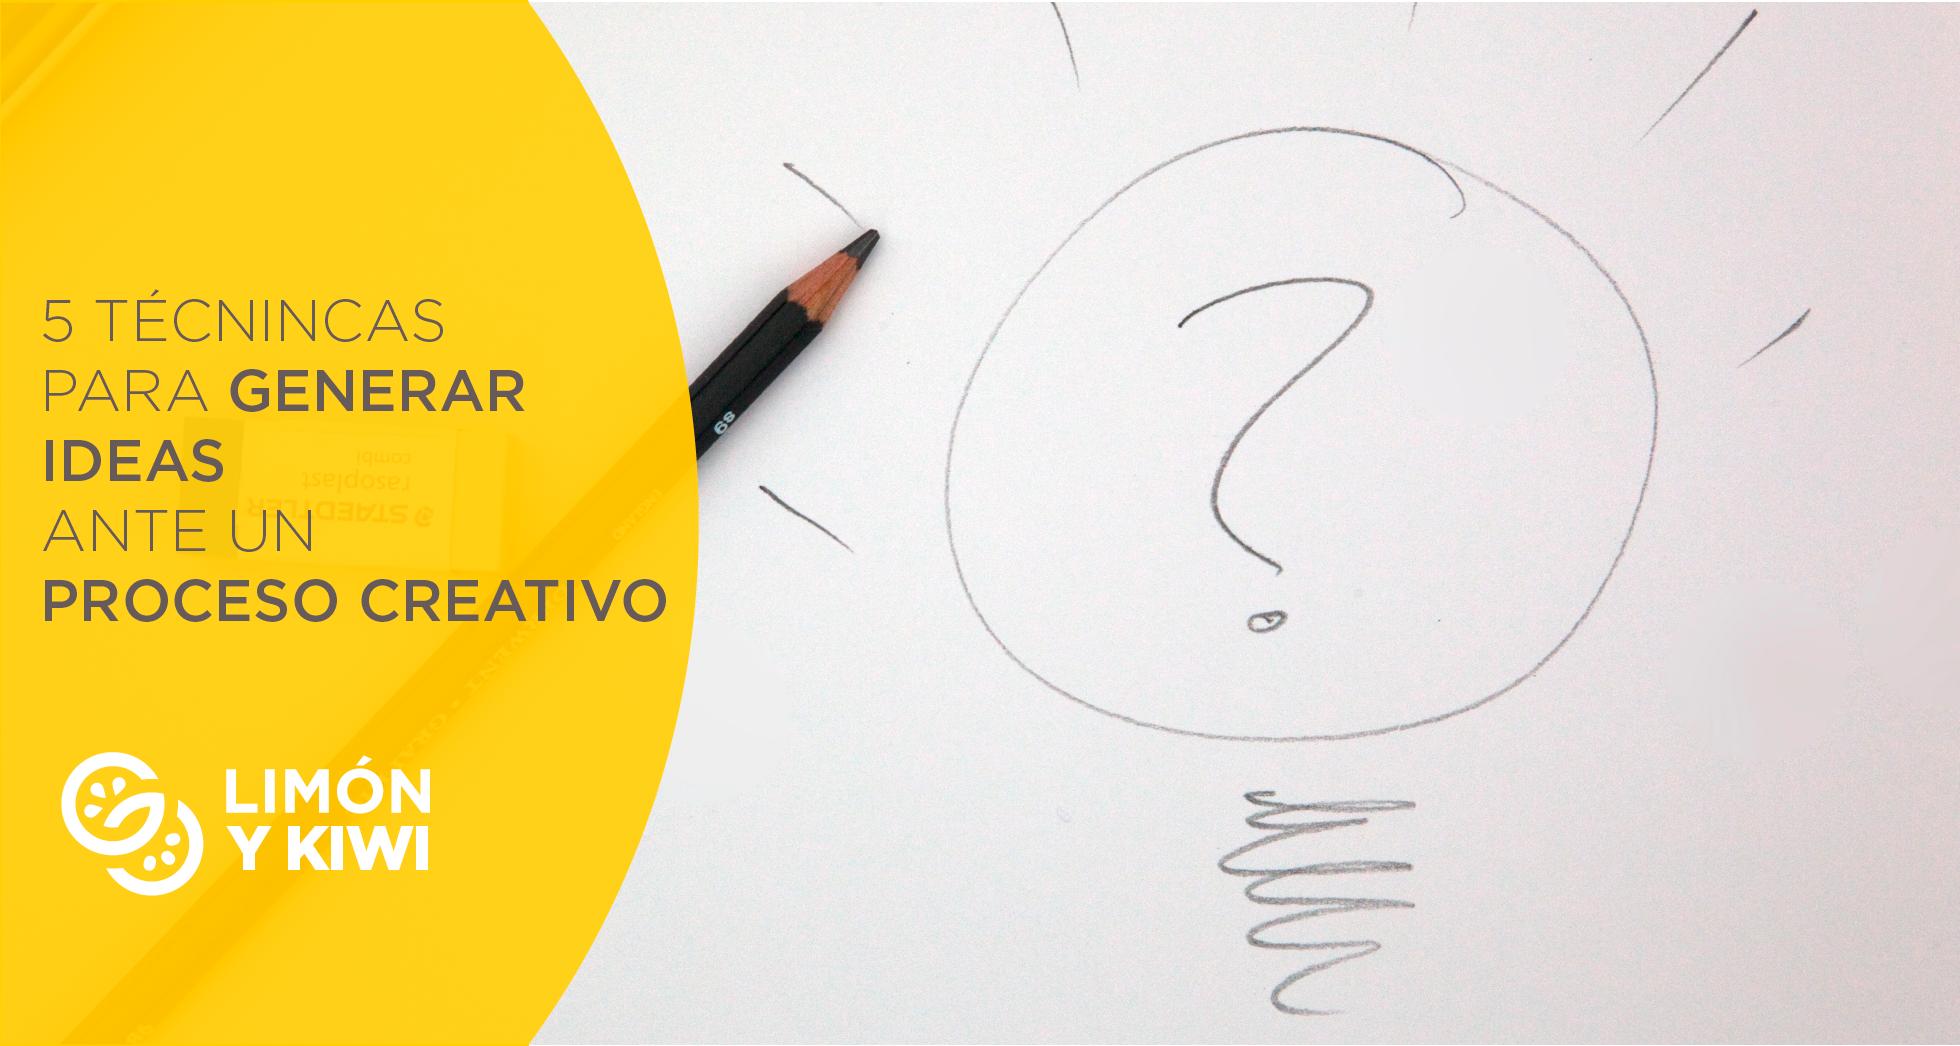 5 técnica para generar ideas ante un proceso creativo